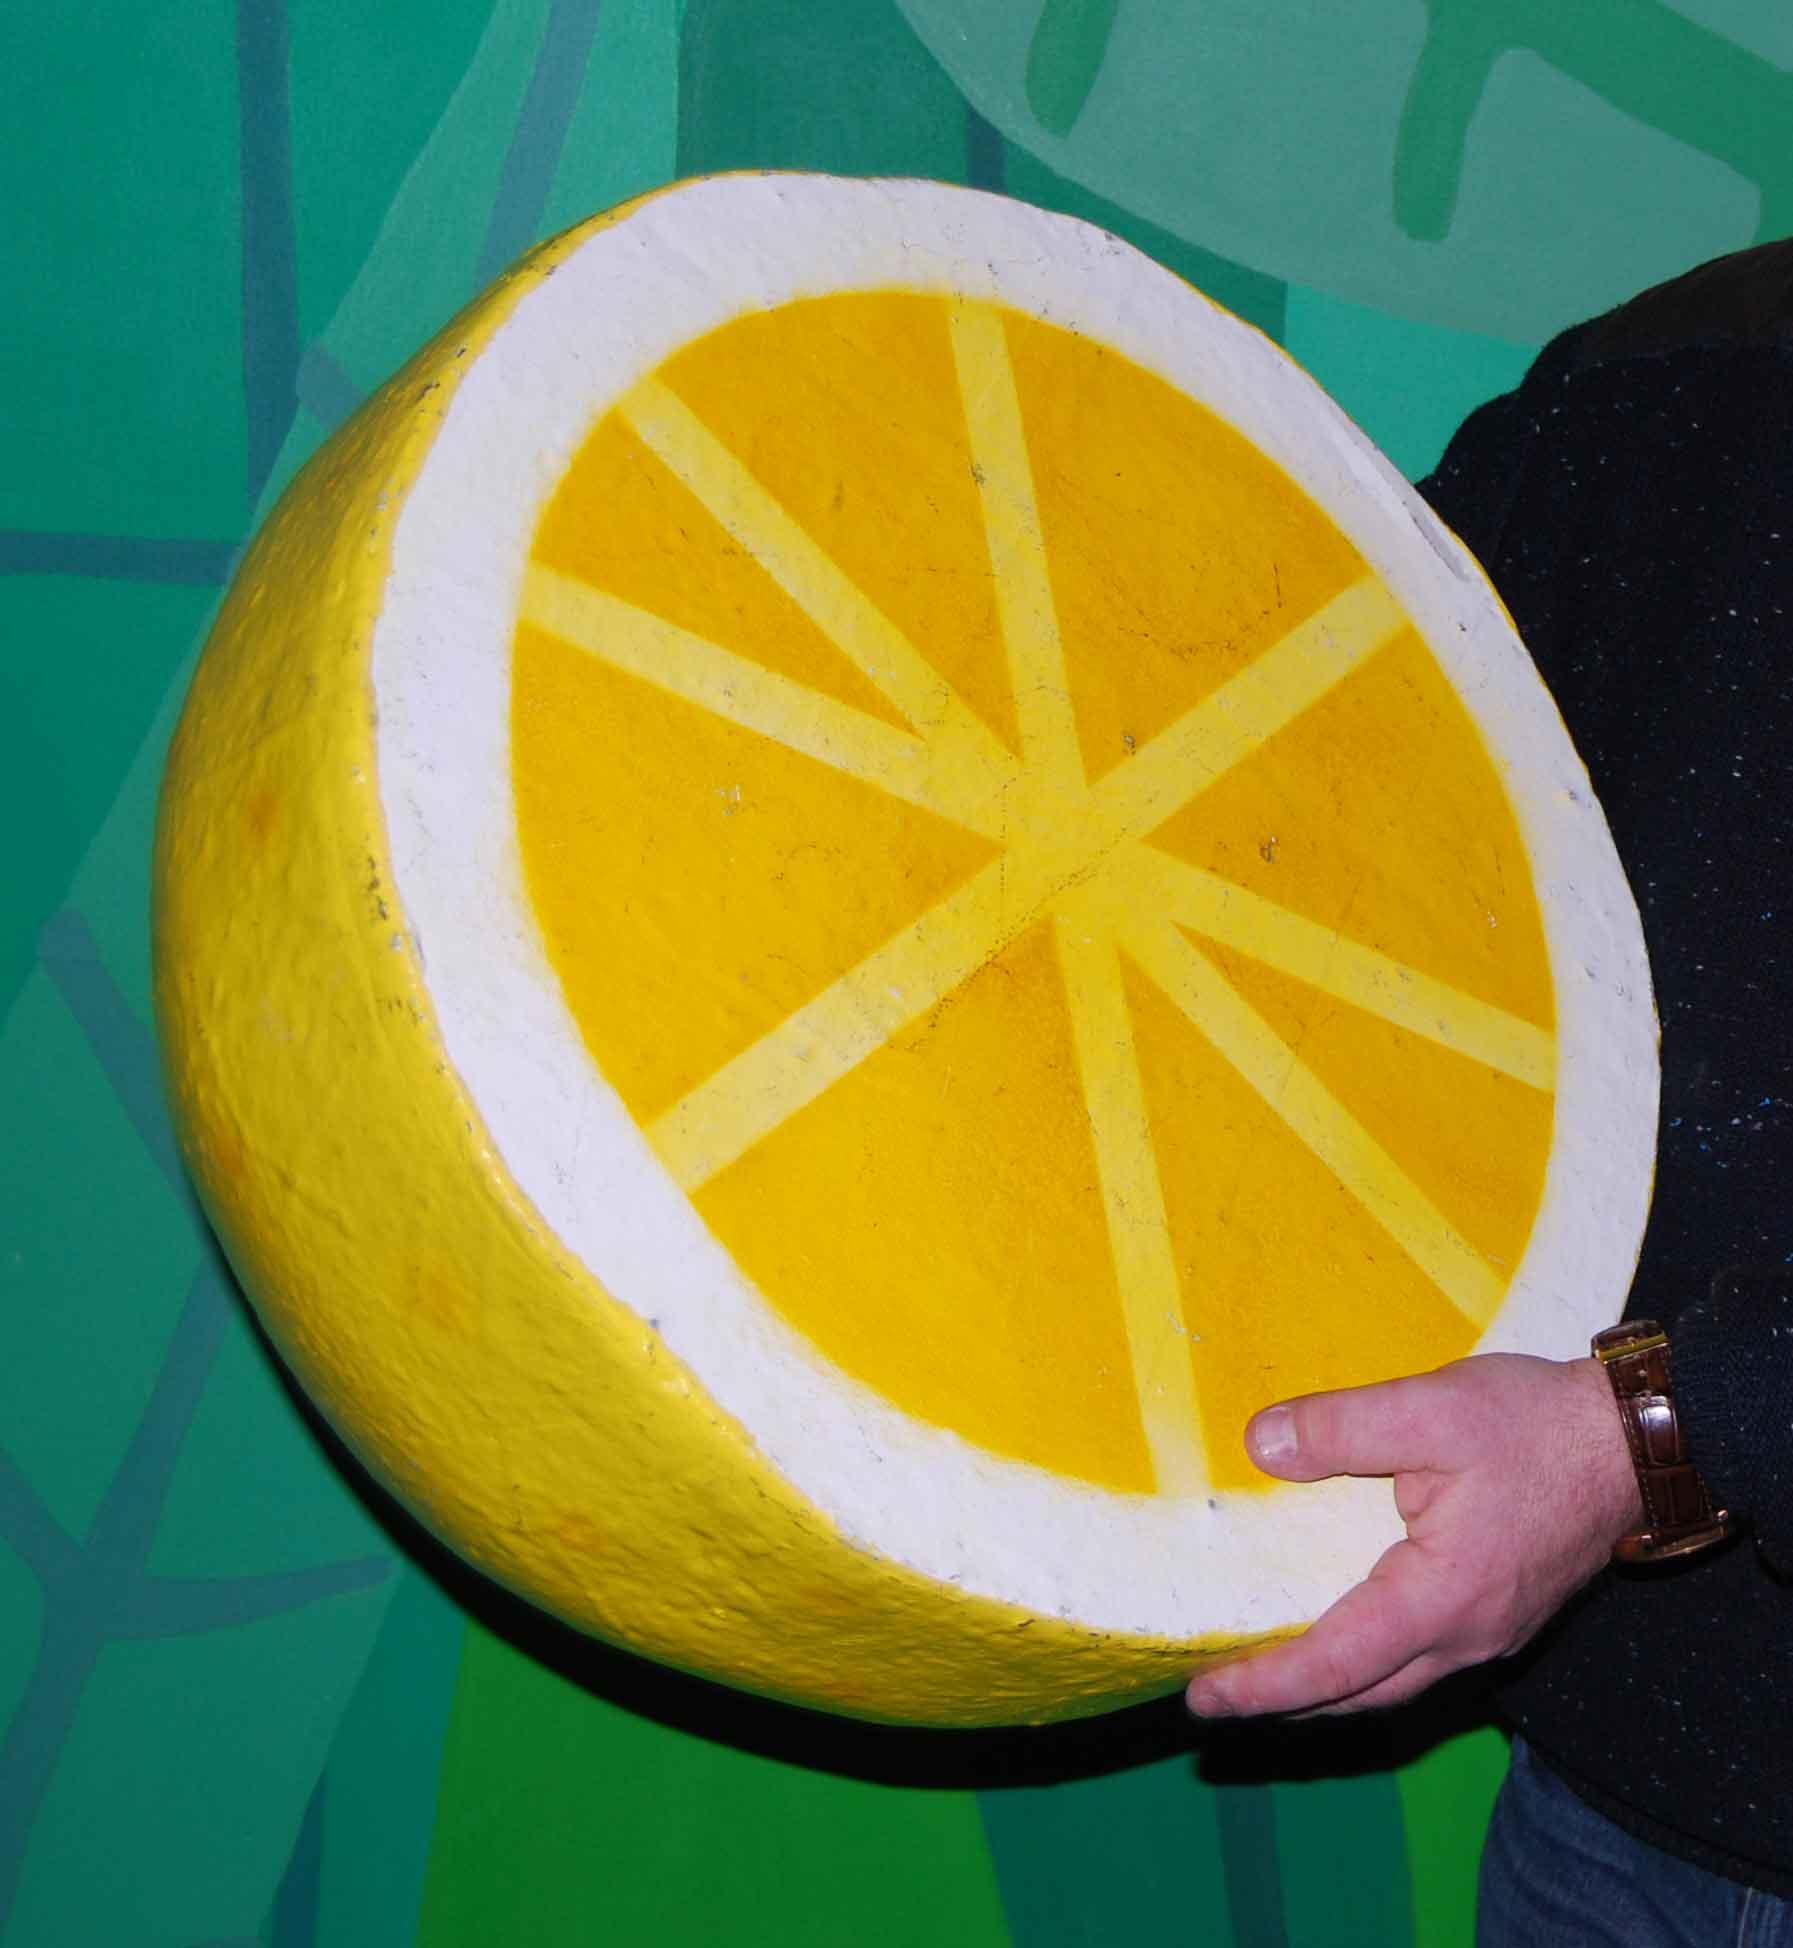 ben-&-holly-lemon